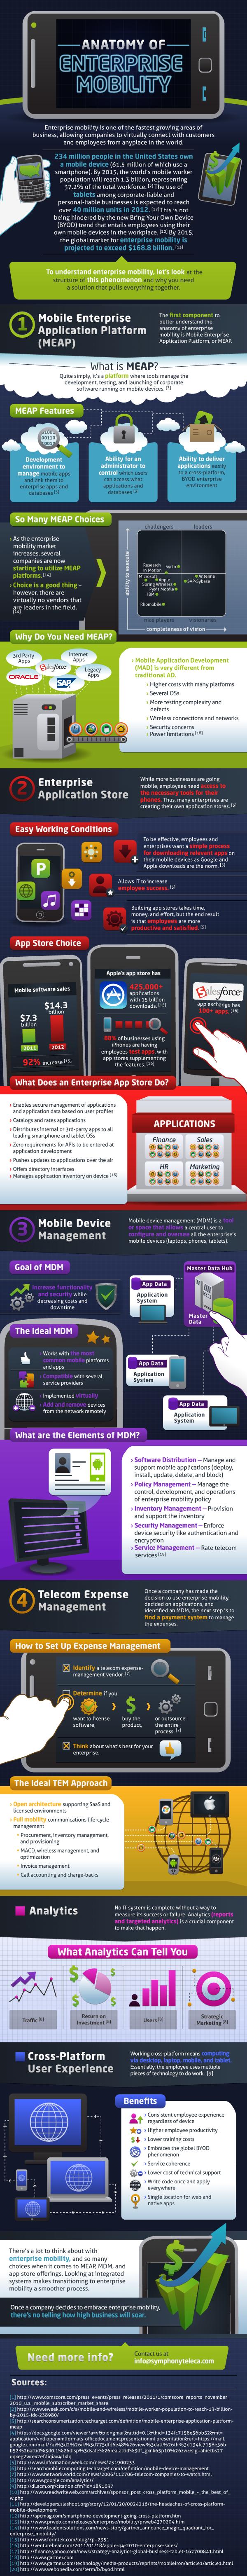 Anatomy of #enterprise mobility